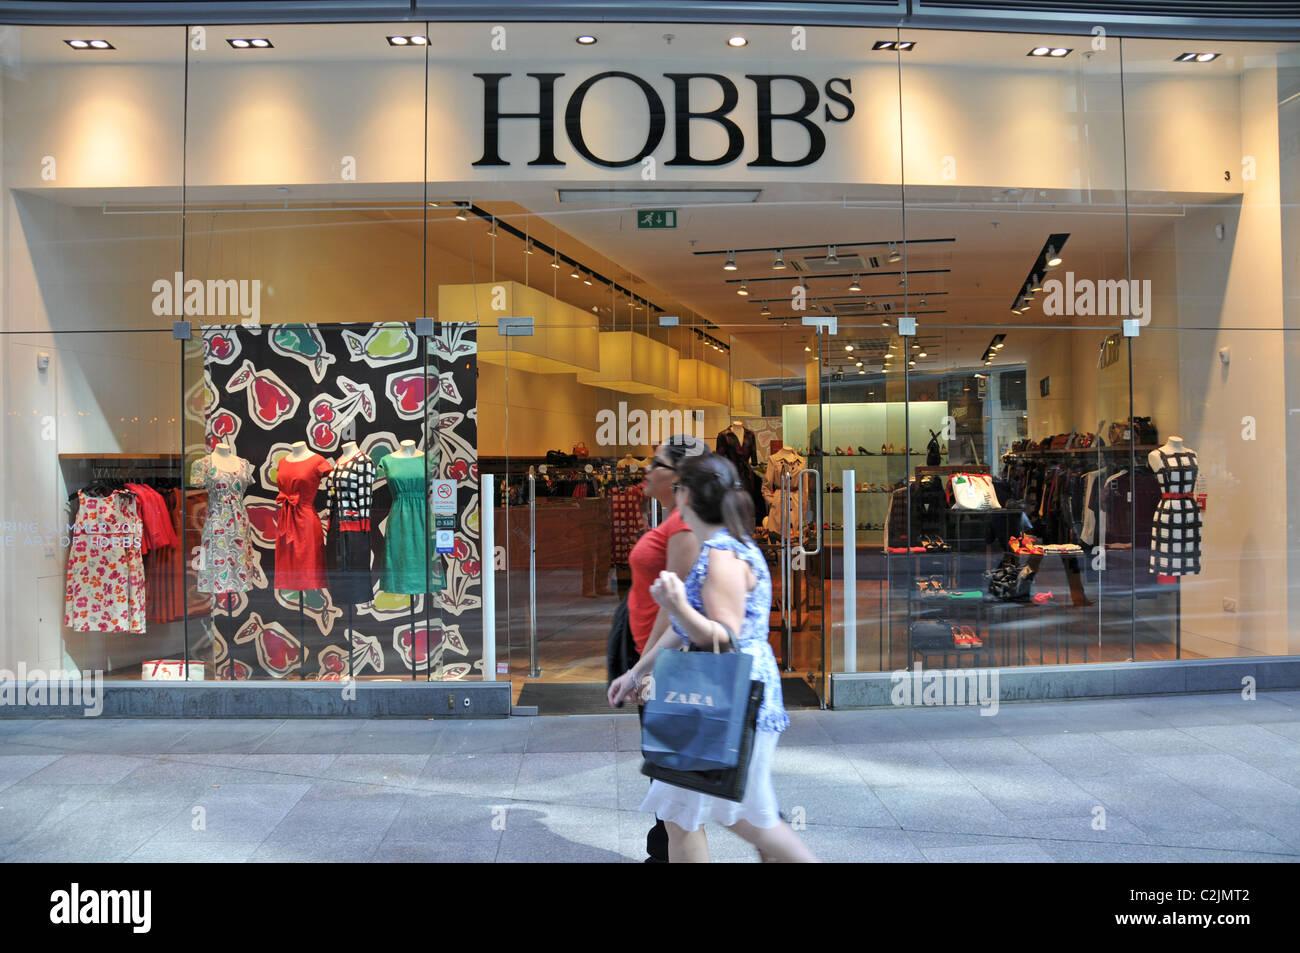 ae5d3c0d650d Hobbs womens designer clothes store London shopping centre - Stock Image